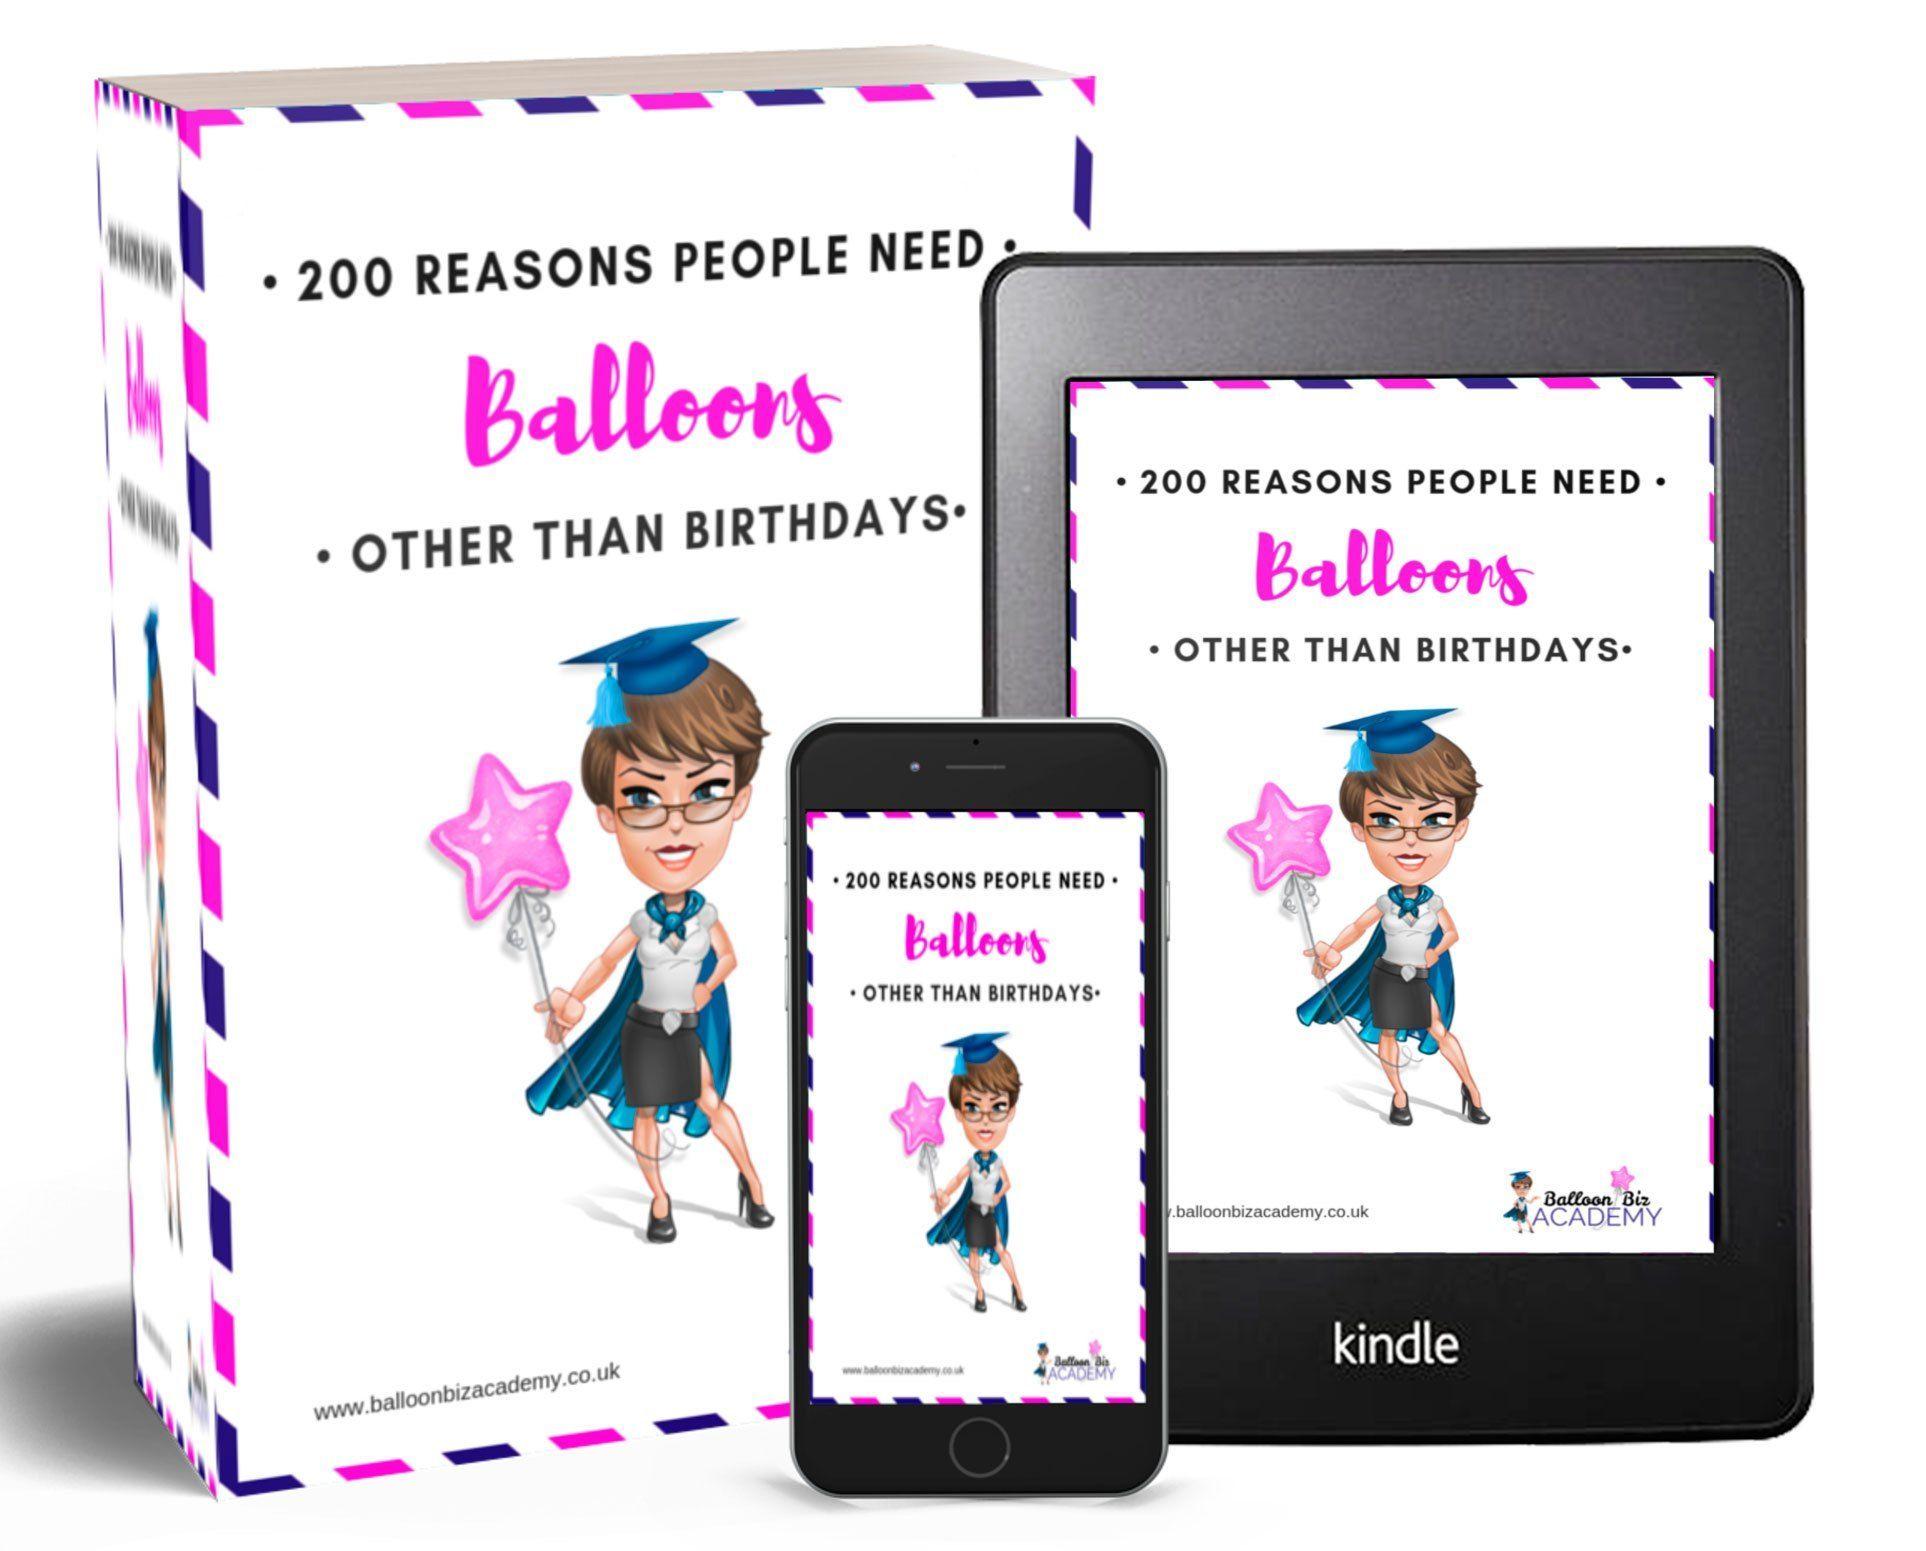 Free Stuff Balloon Biz Academy (With images) Resource